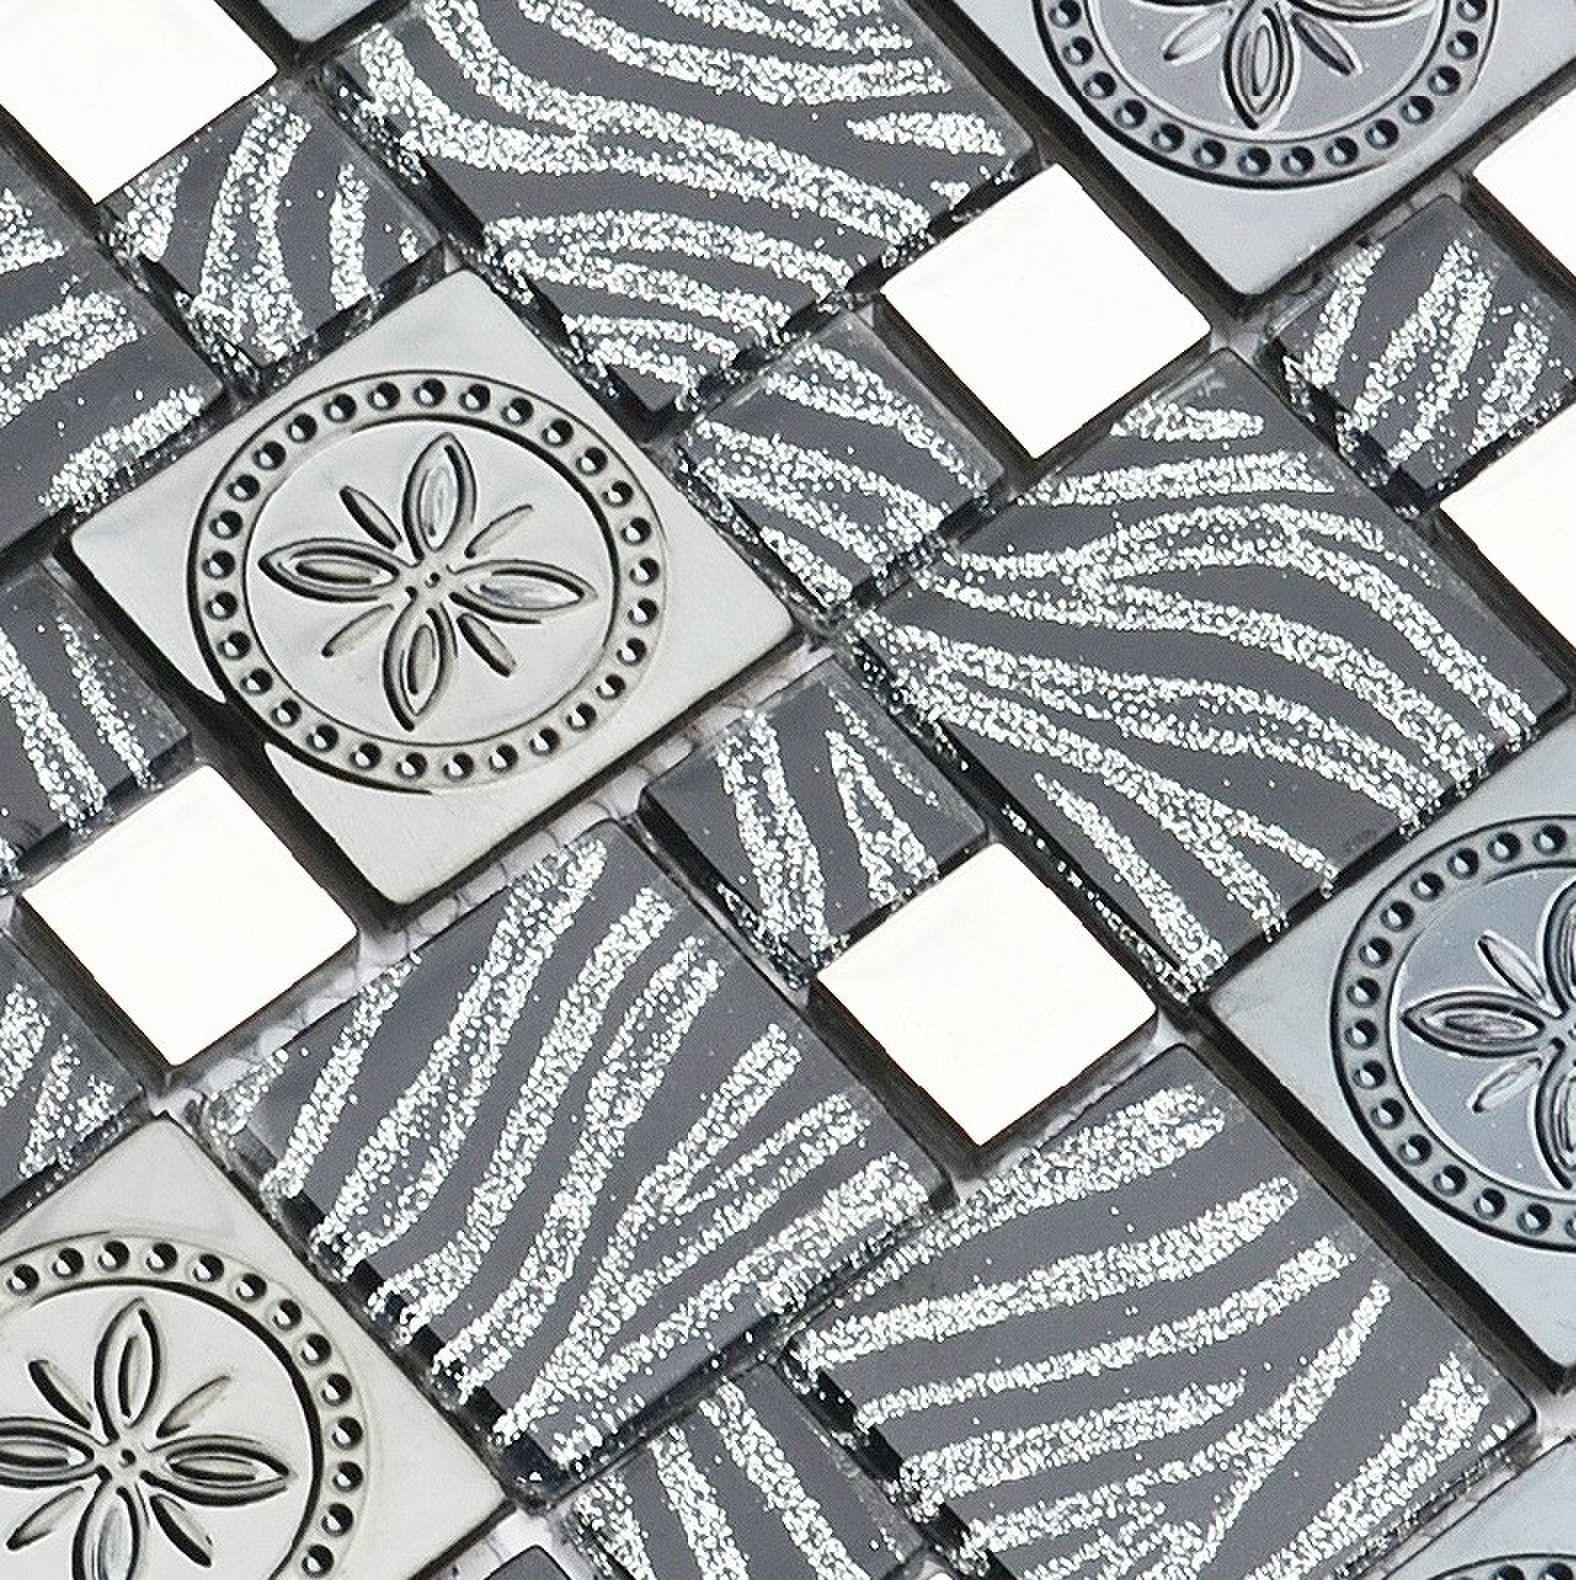 Stainless steel tile backsplash SSMT291 kitchen mosaic glass wall ...